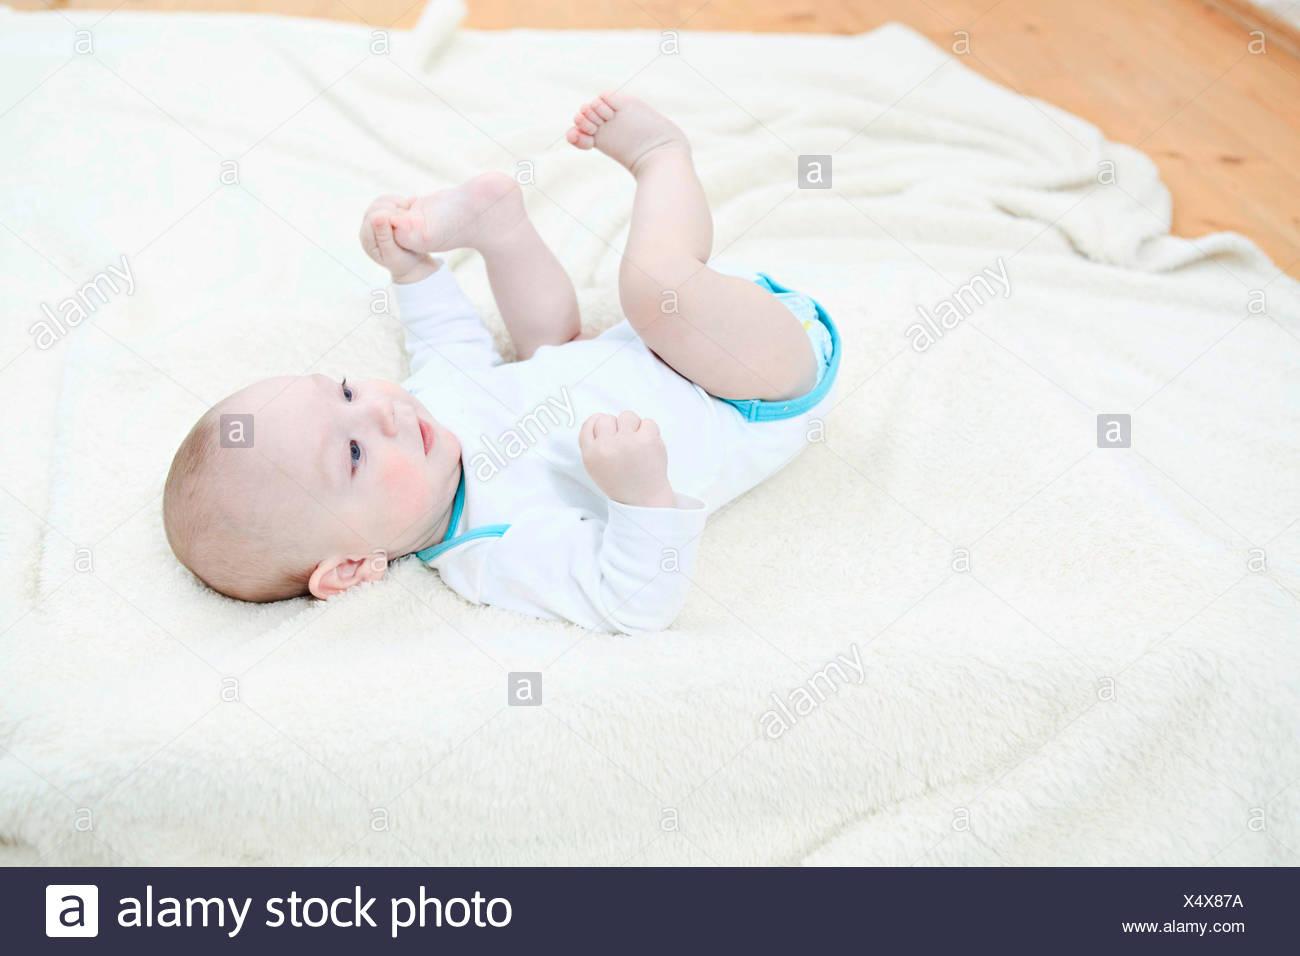 Baby Boy laying on blanket Photo Stock